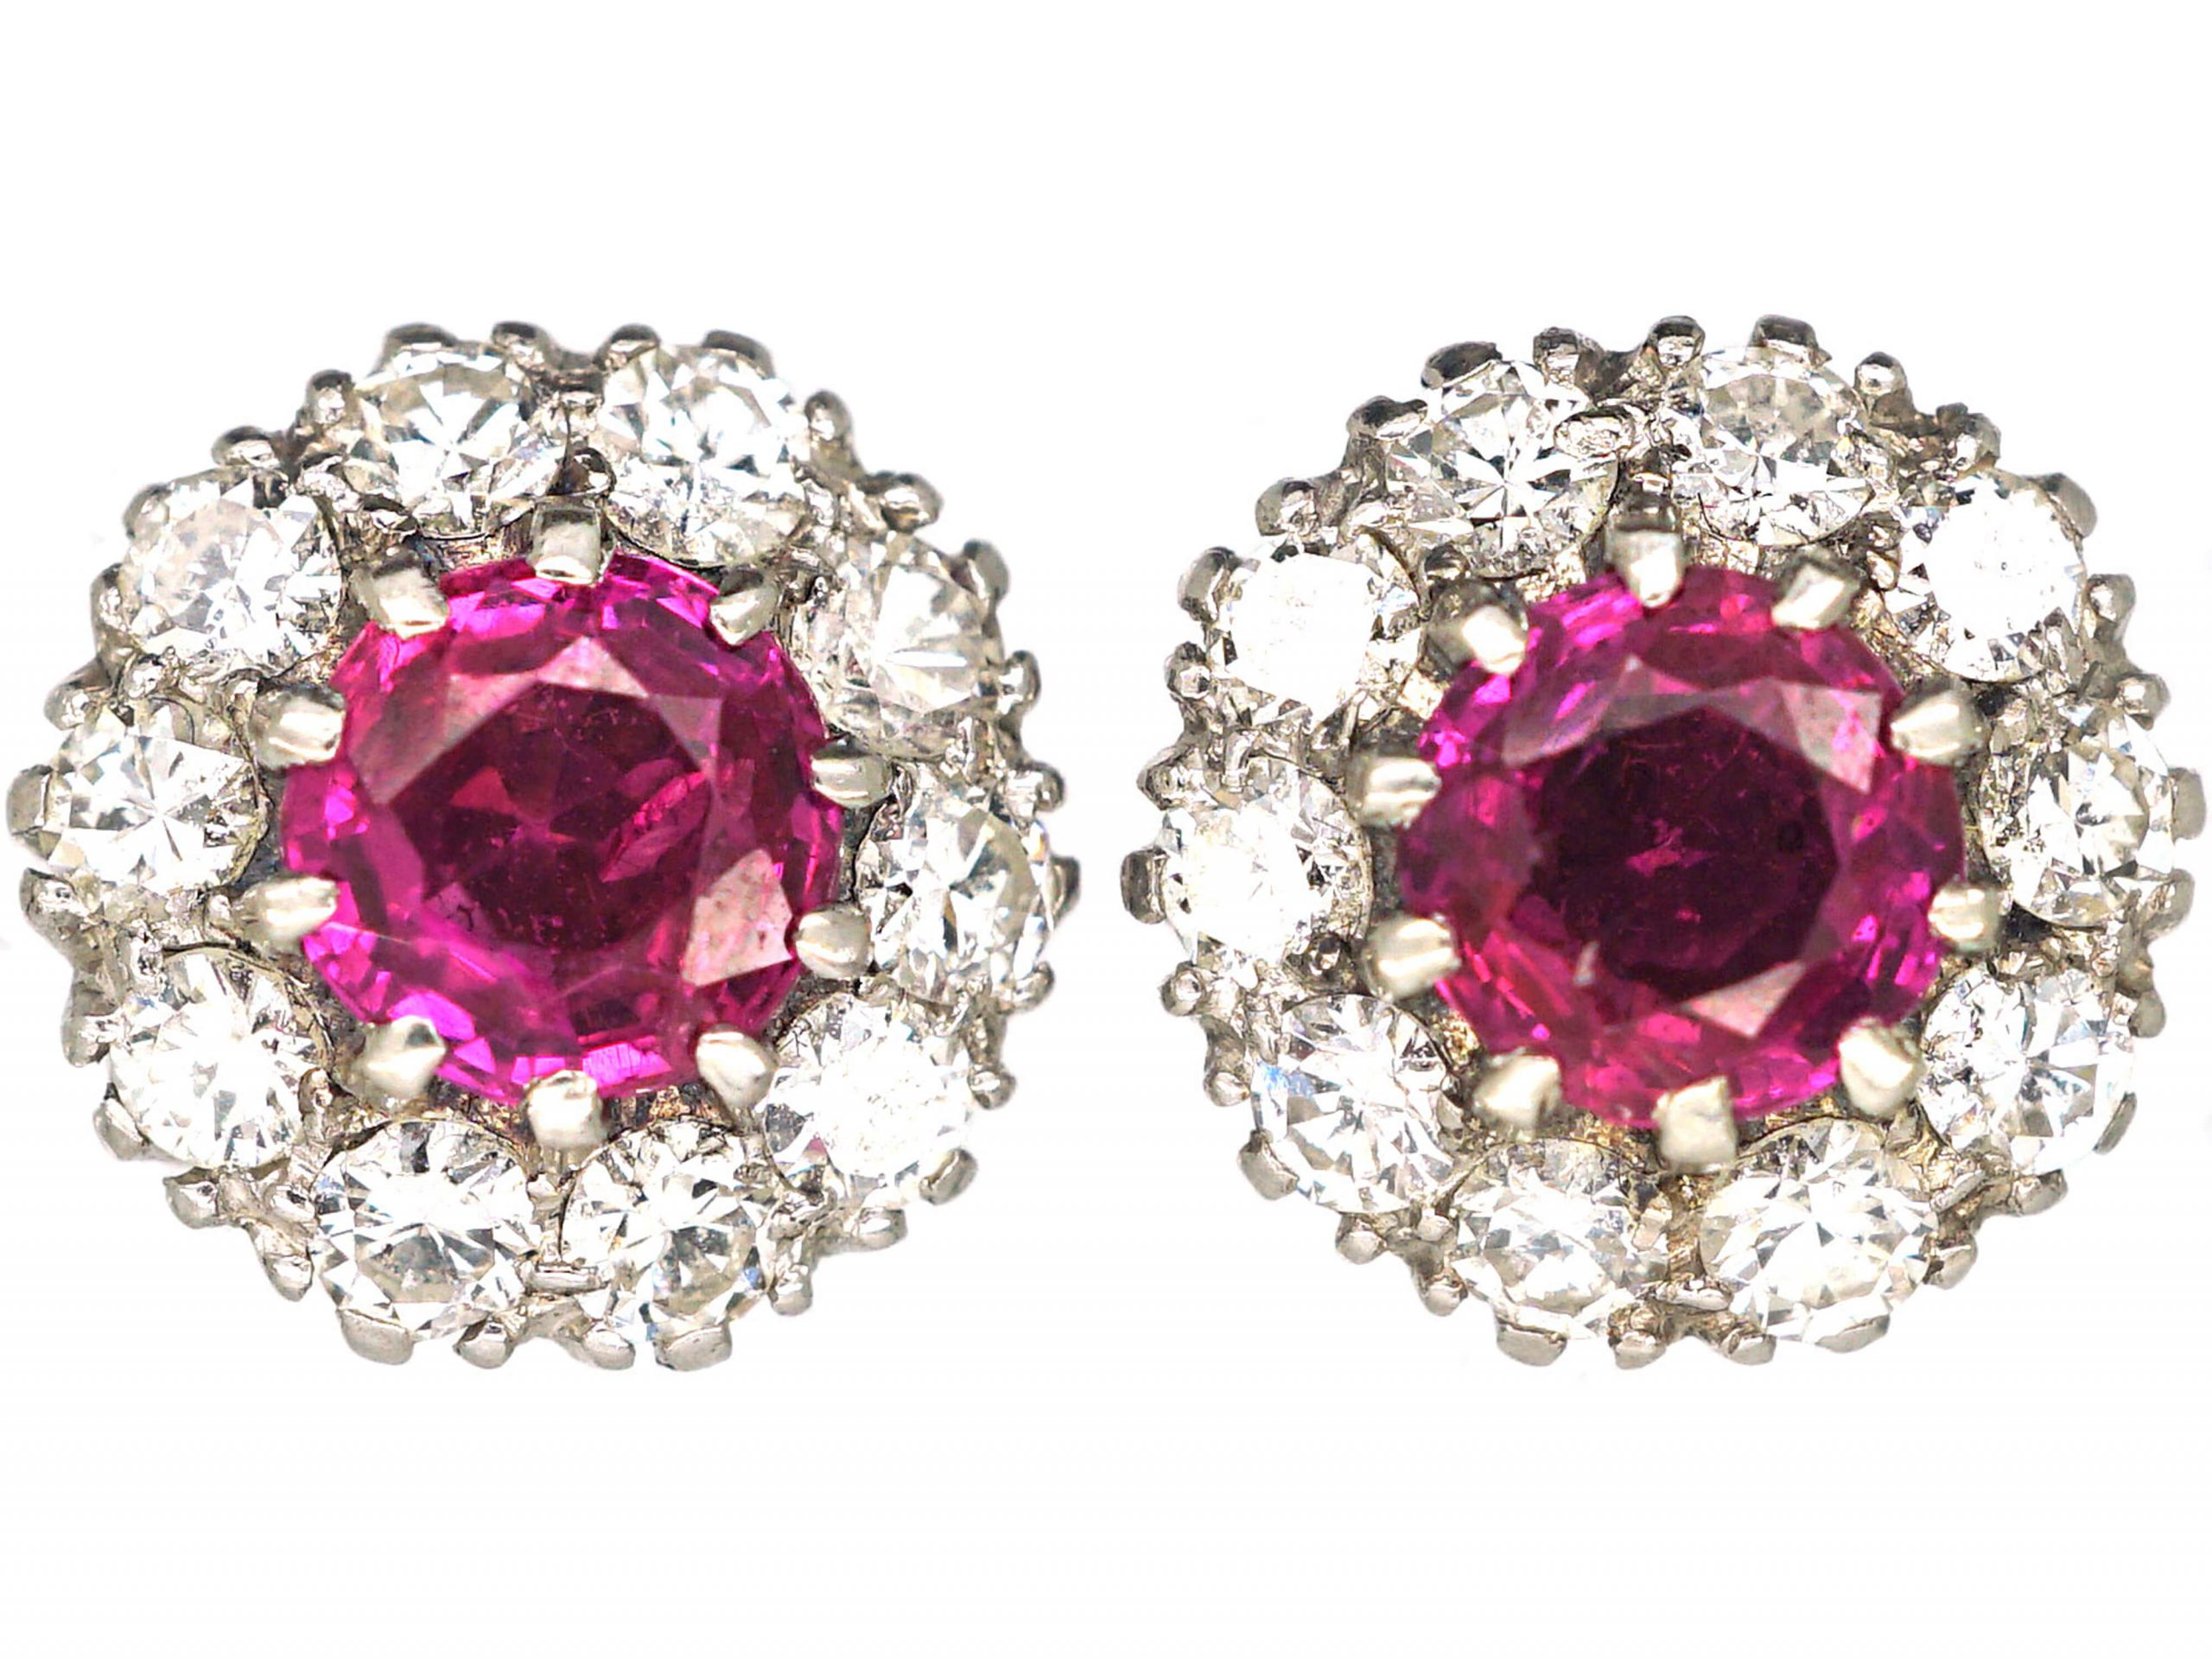 18ct White Gold, Ruby & Diamond Cluster Earrings